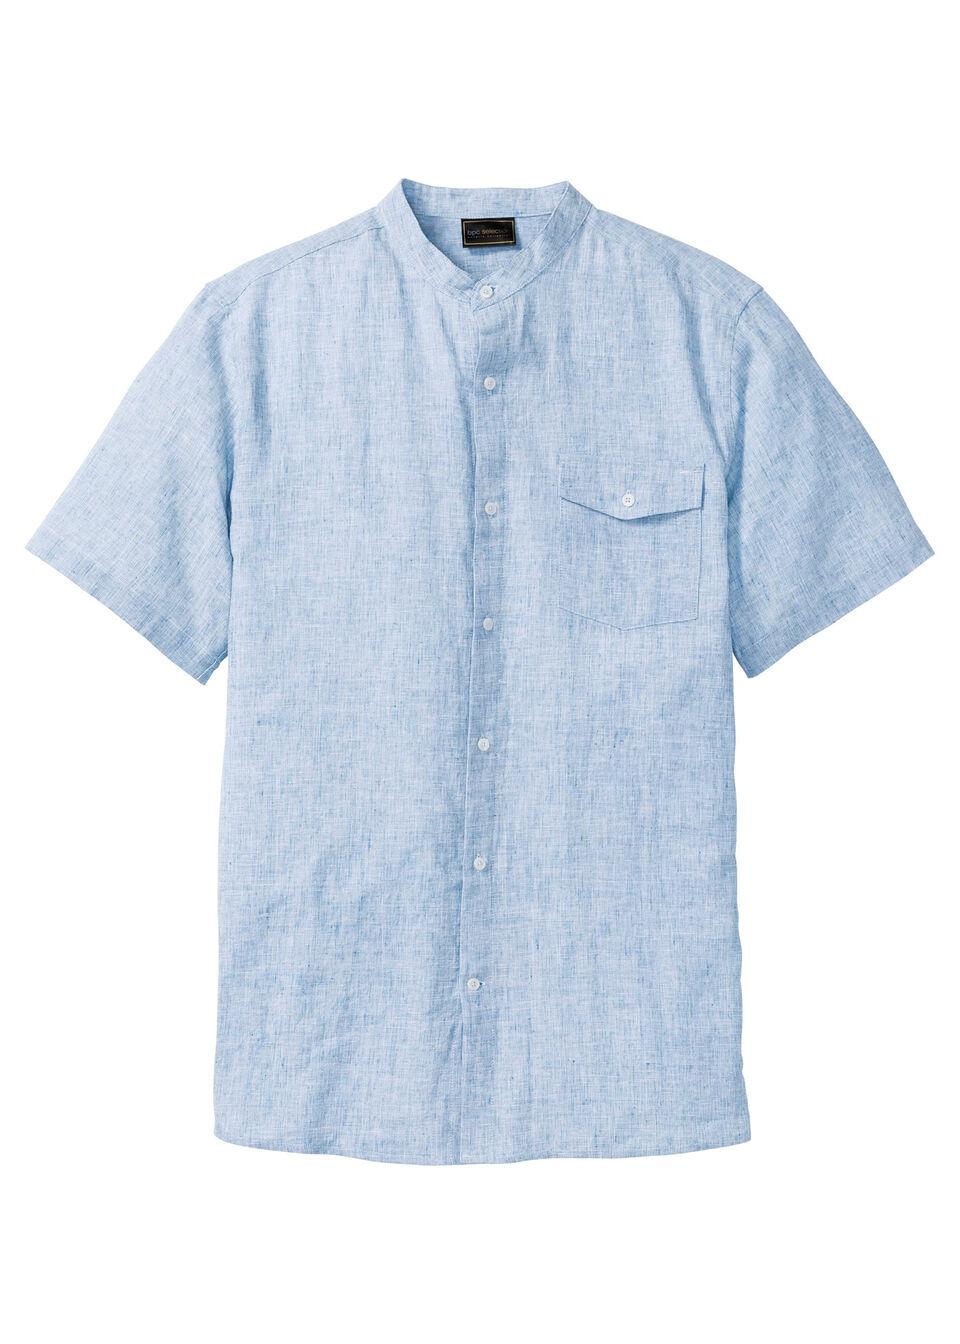 Рубашка с короткими рукавами от bonprix